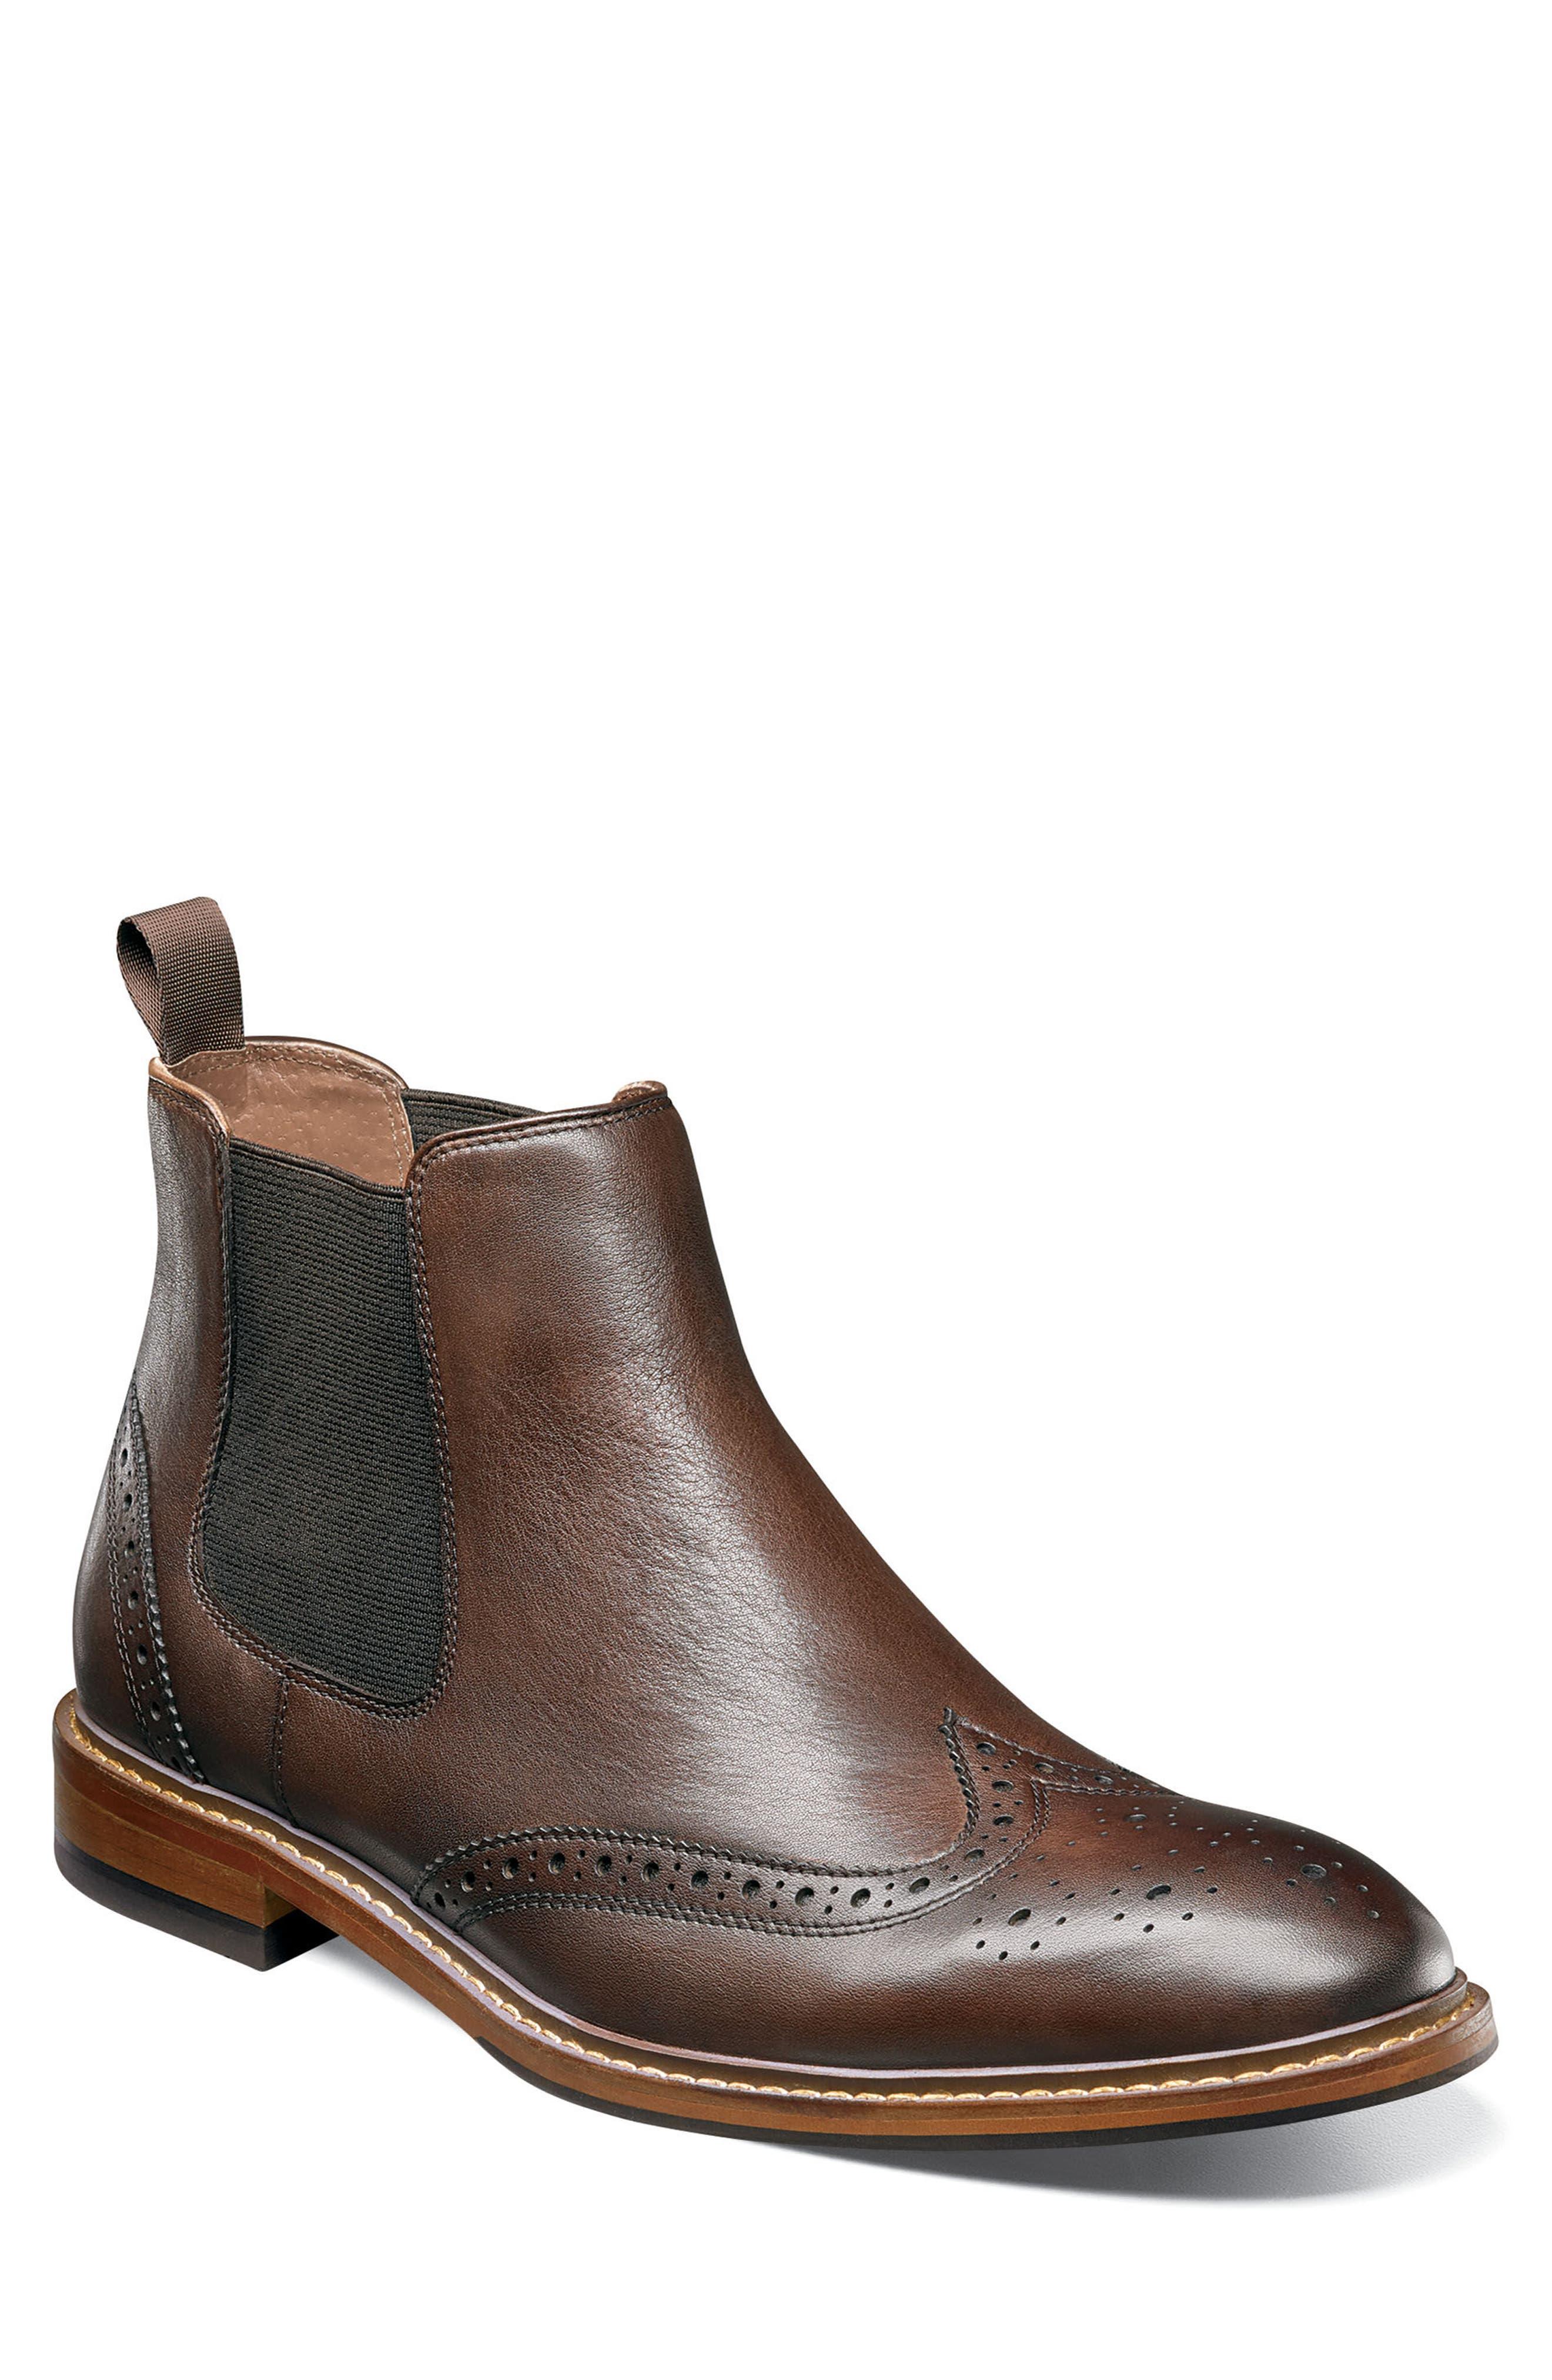 Main Image - Florsheim Sheffield Chelsea Boot (Men)